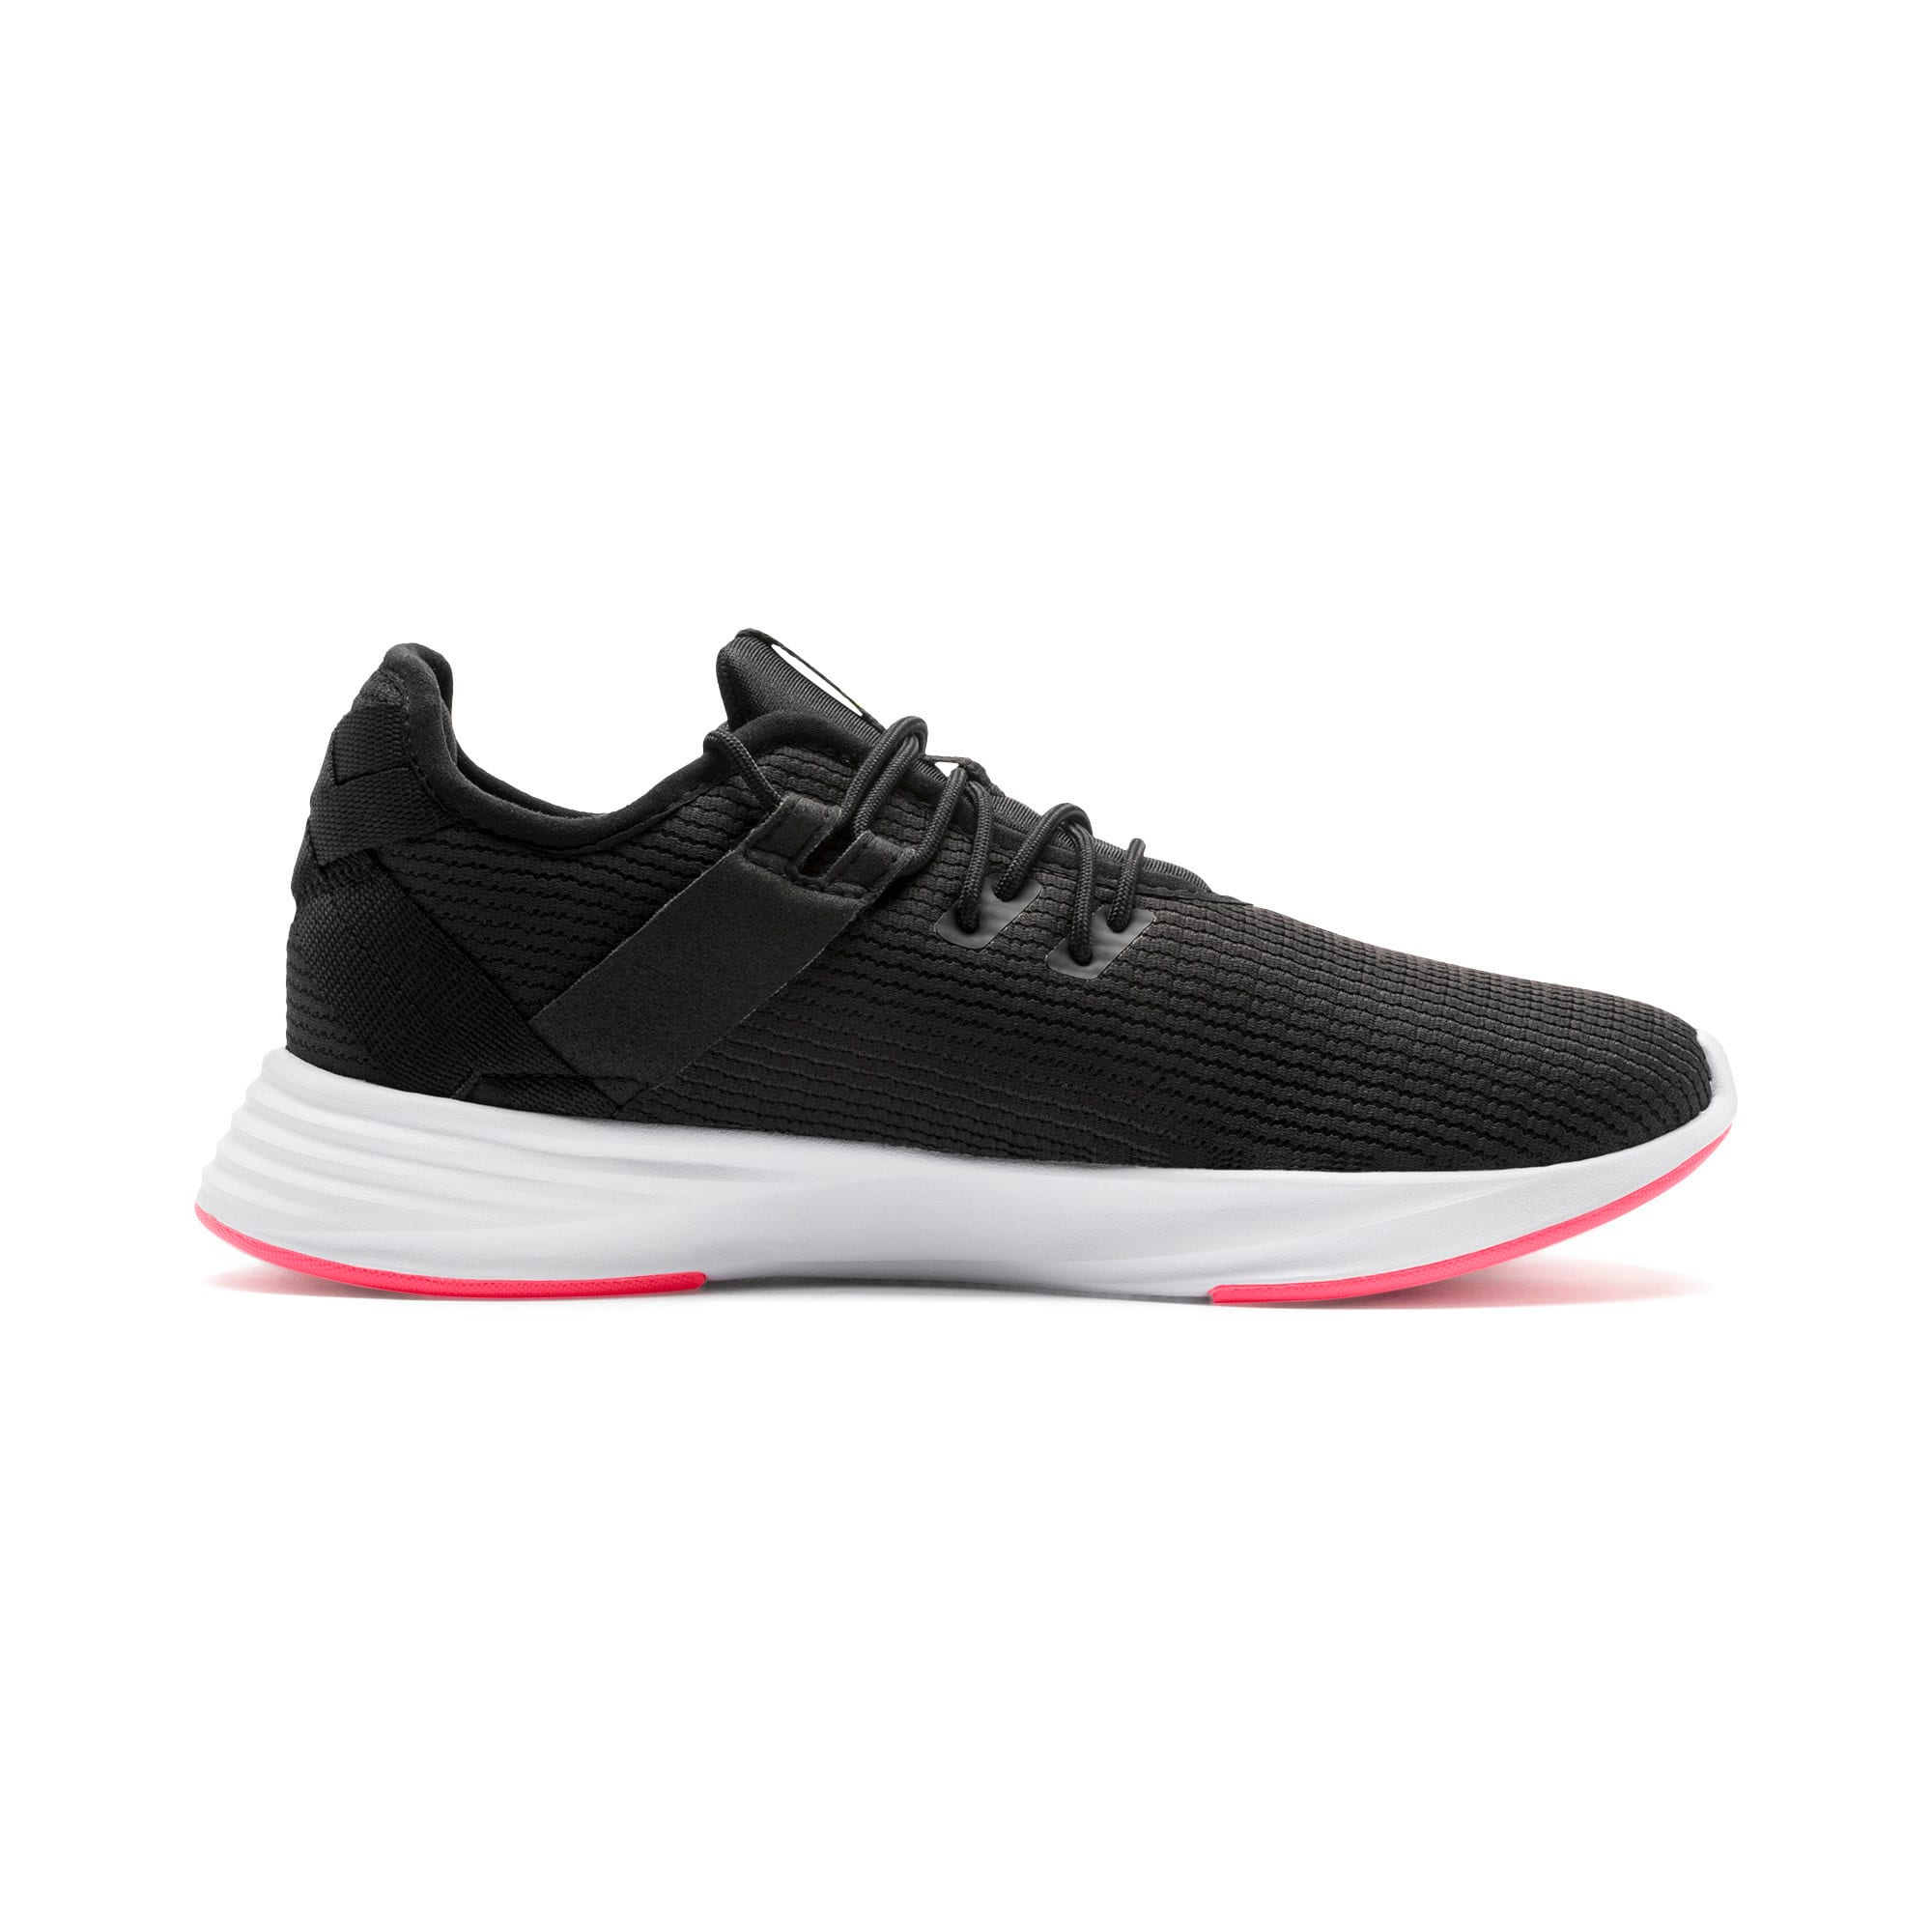 Thumbnail 7 of Radiate XT Women's Training Sneakers, Puma Black-Pink Alert, medium-IND